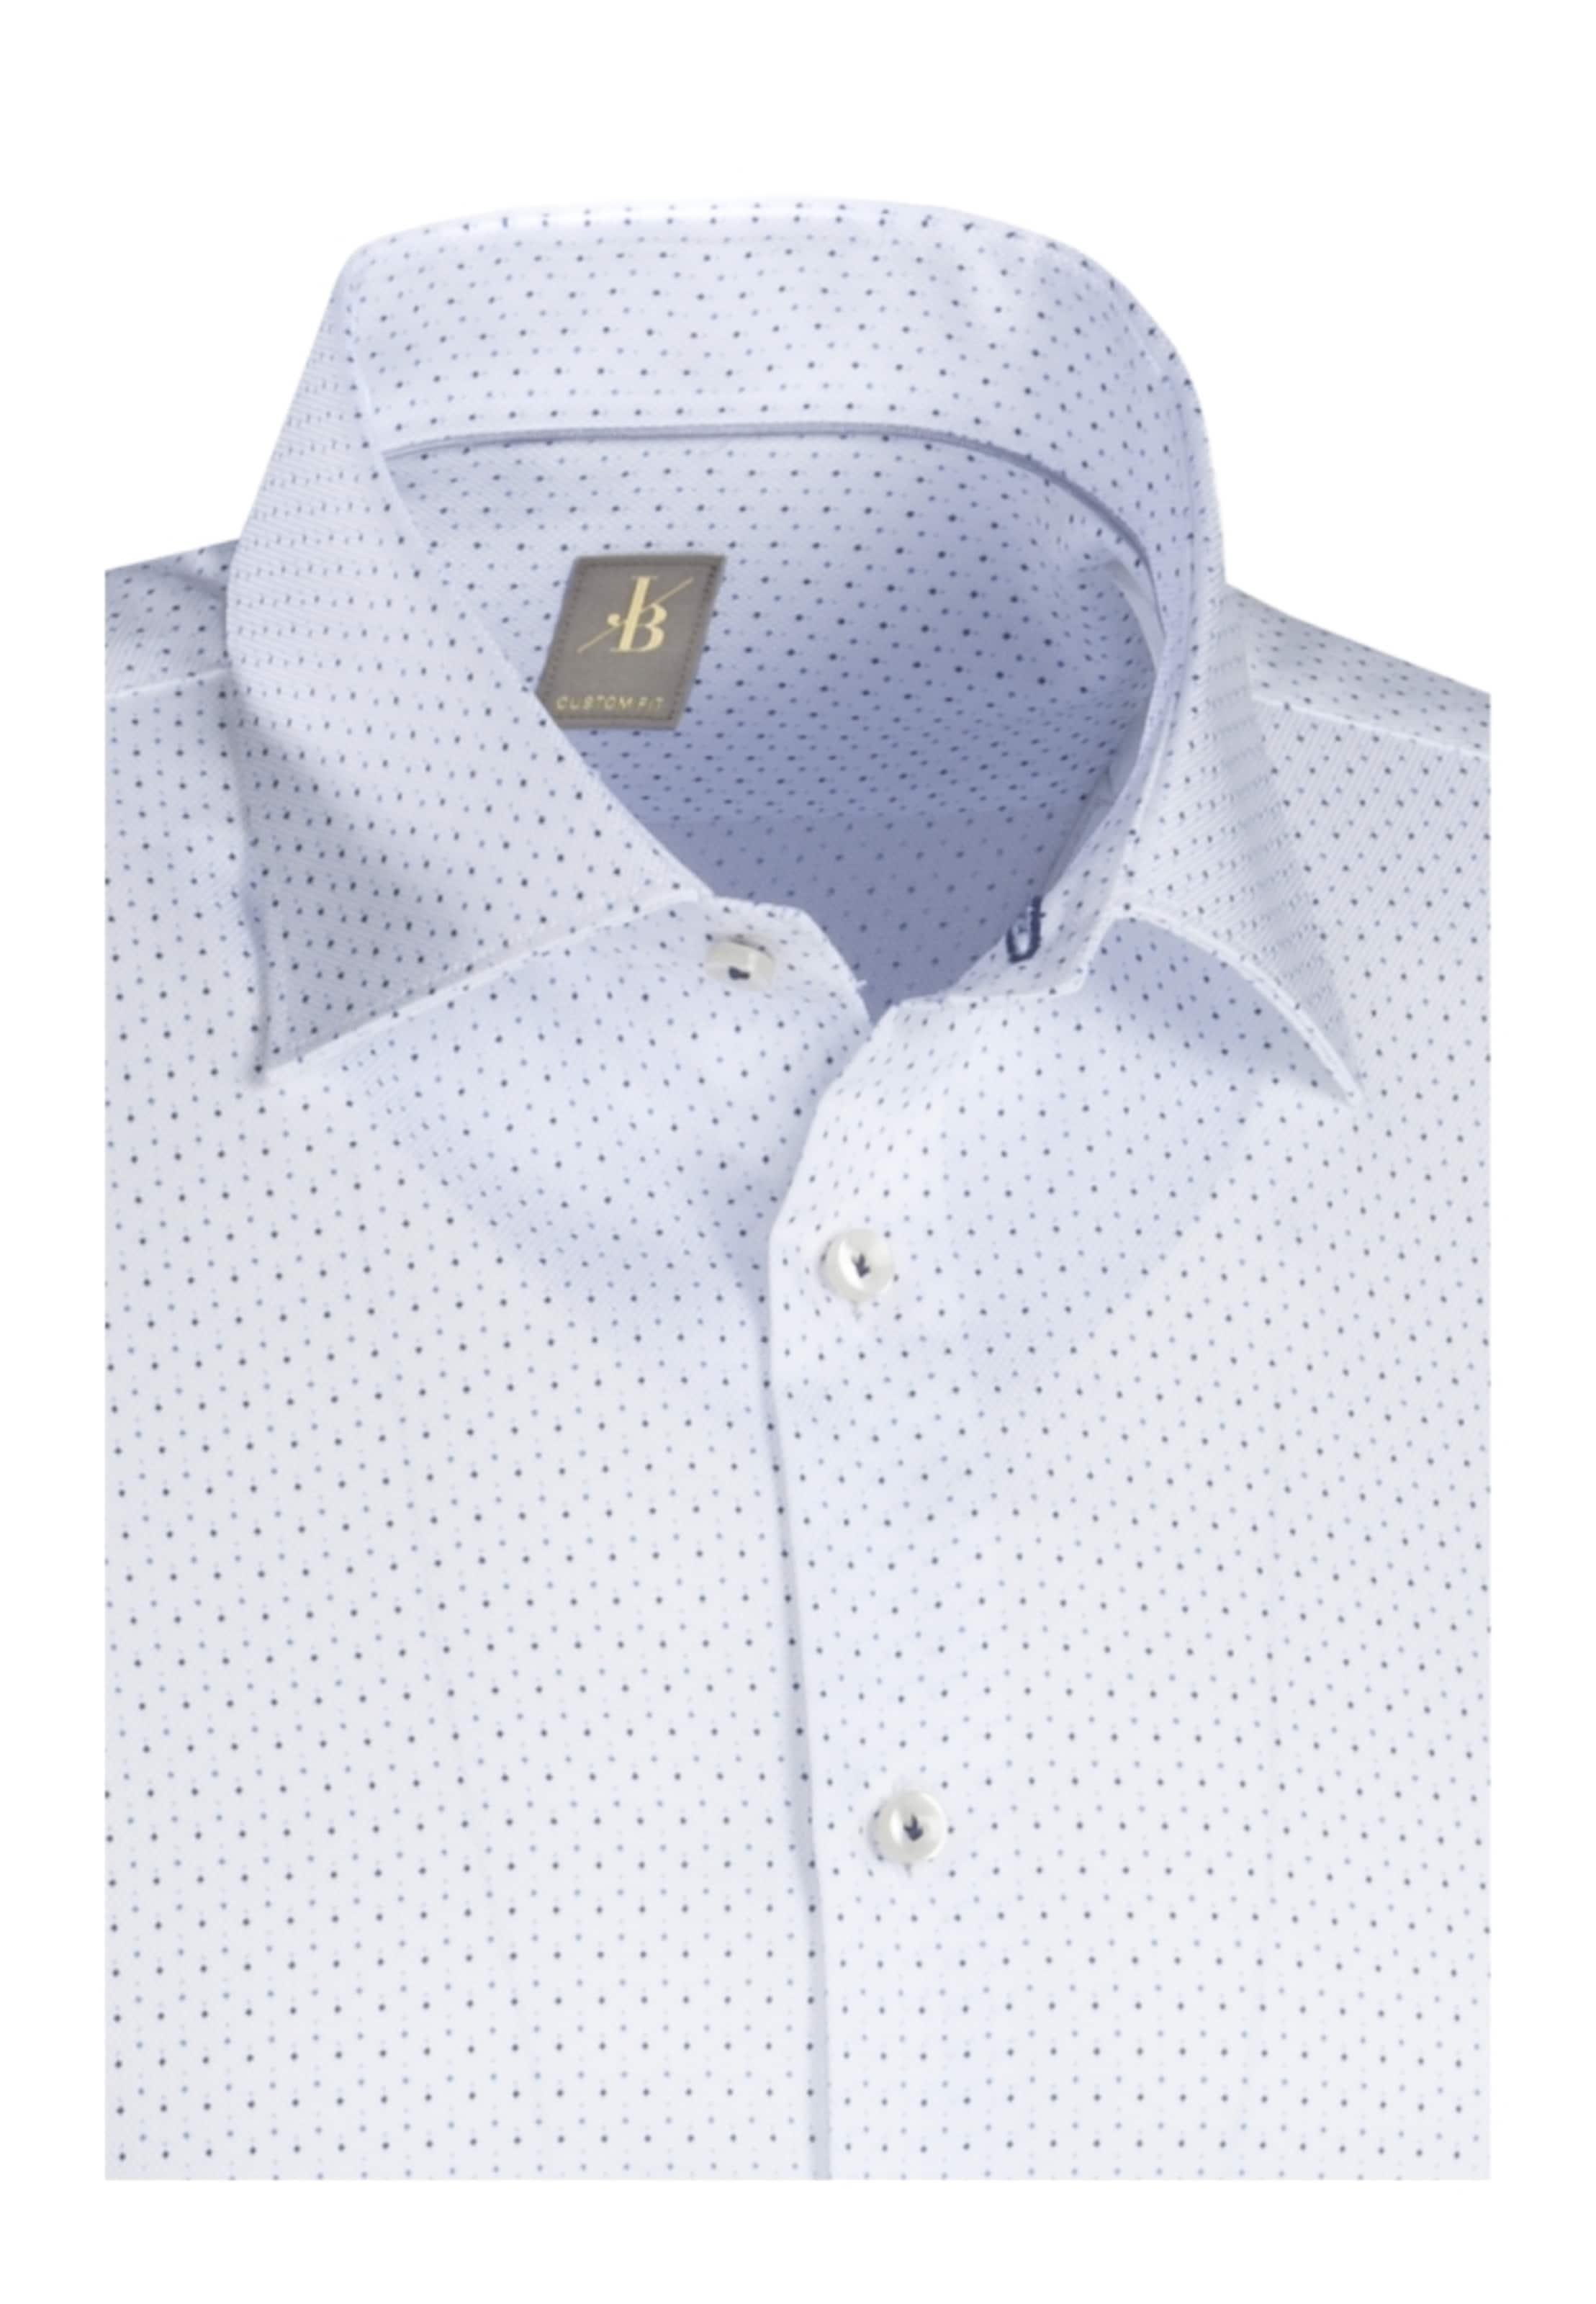 Britt Fit' In 'custom hemd BlauWeiß City Jacques 8k0wPOn